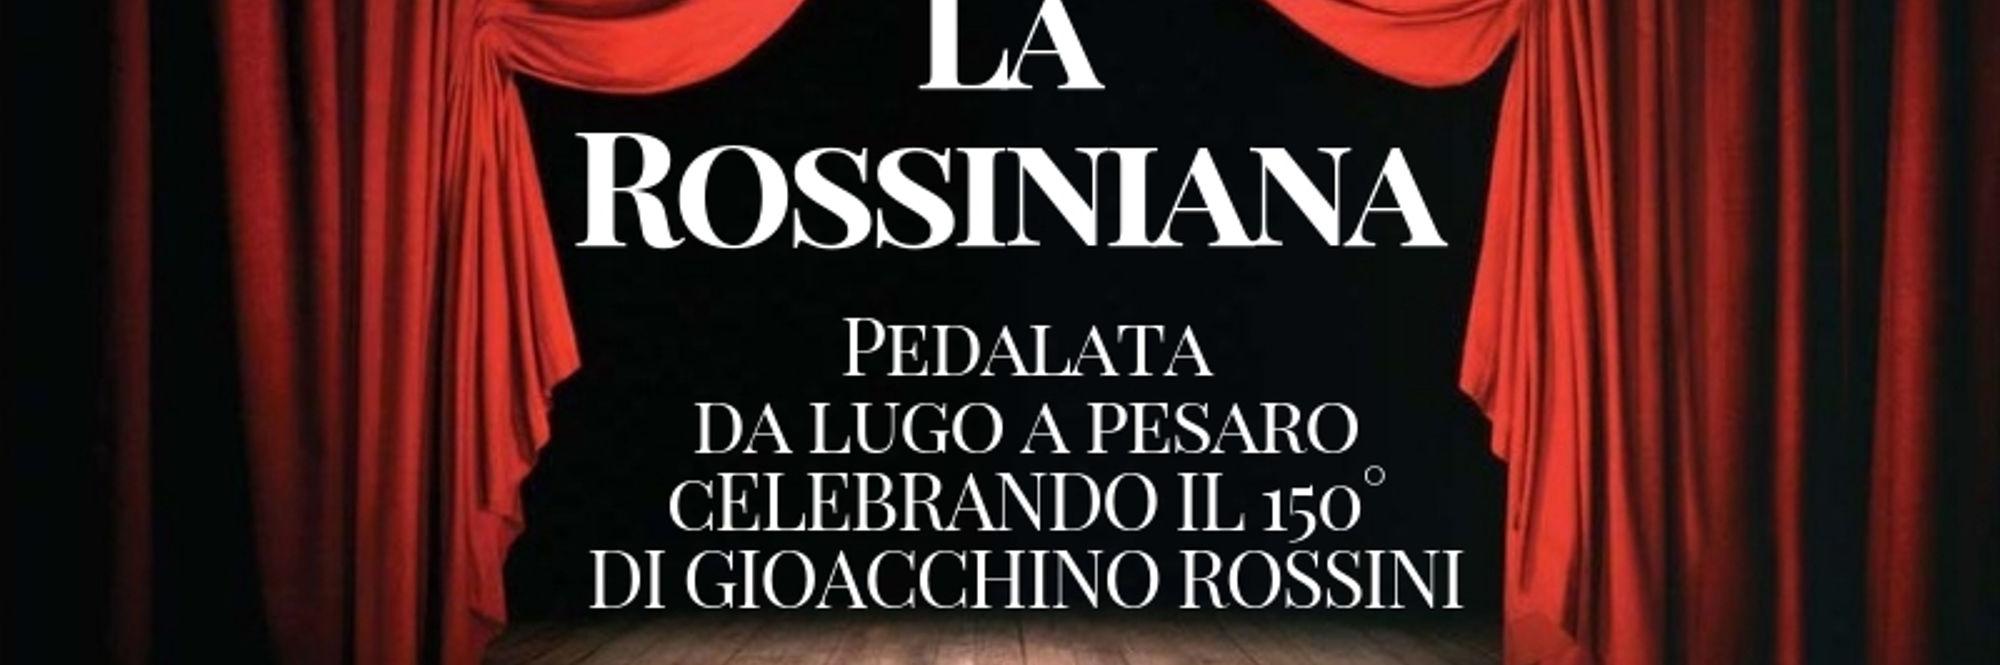 Volantino La Rossiniana